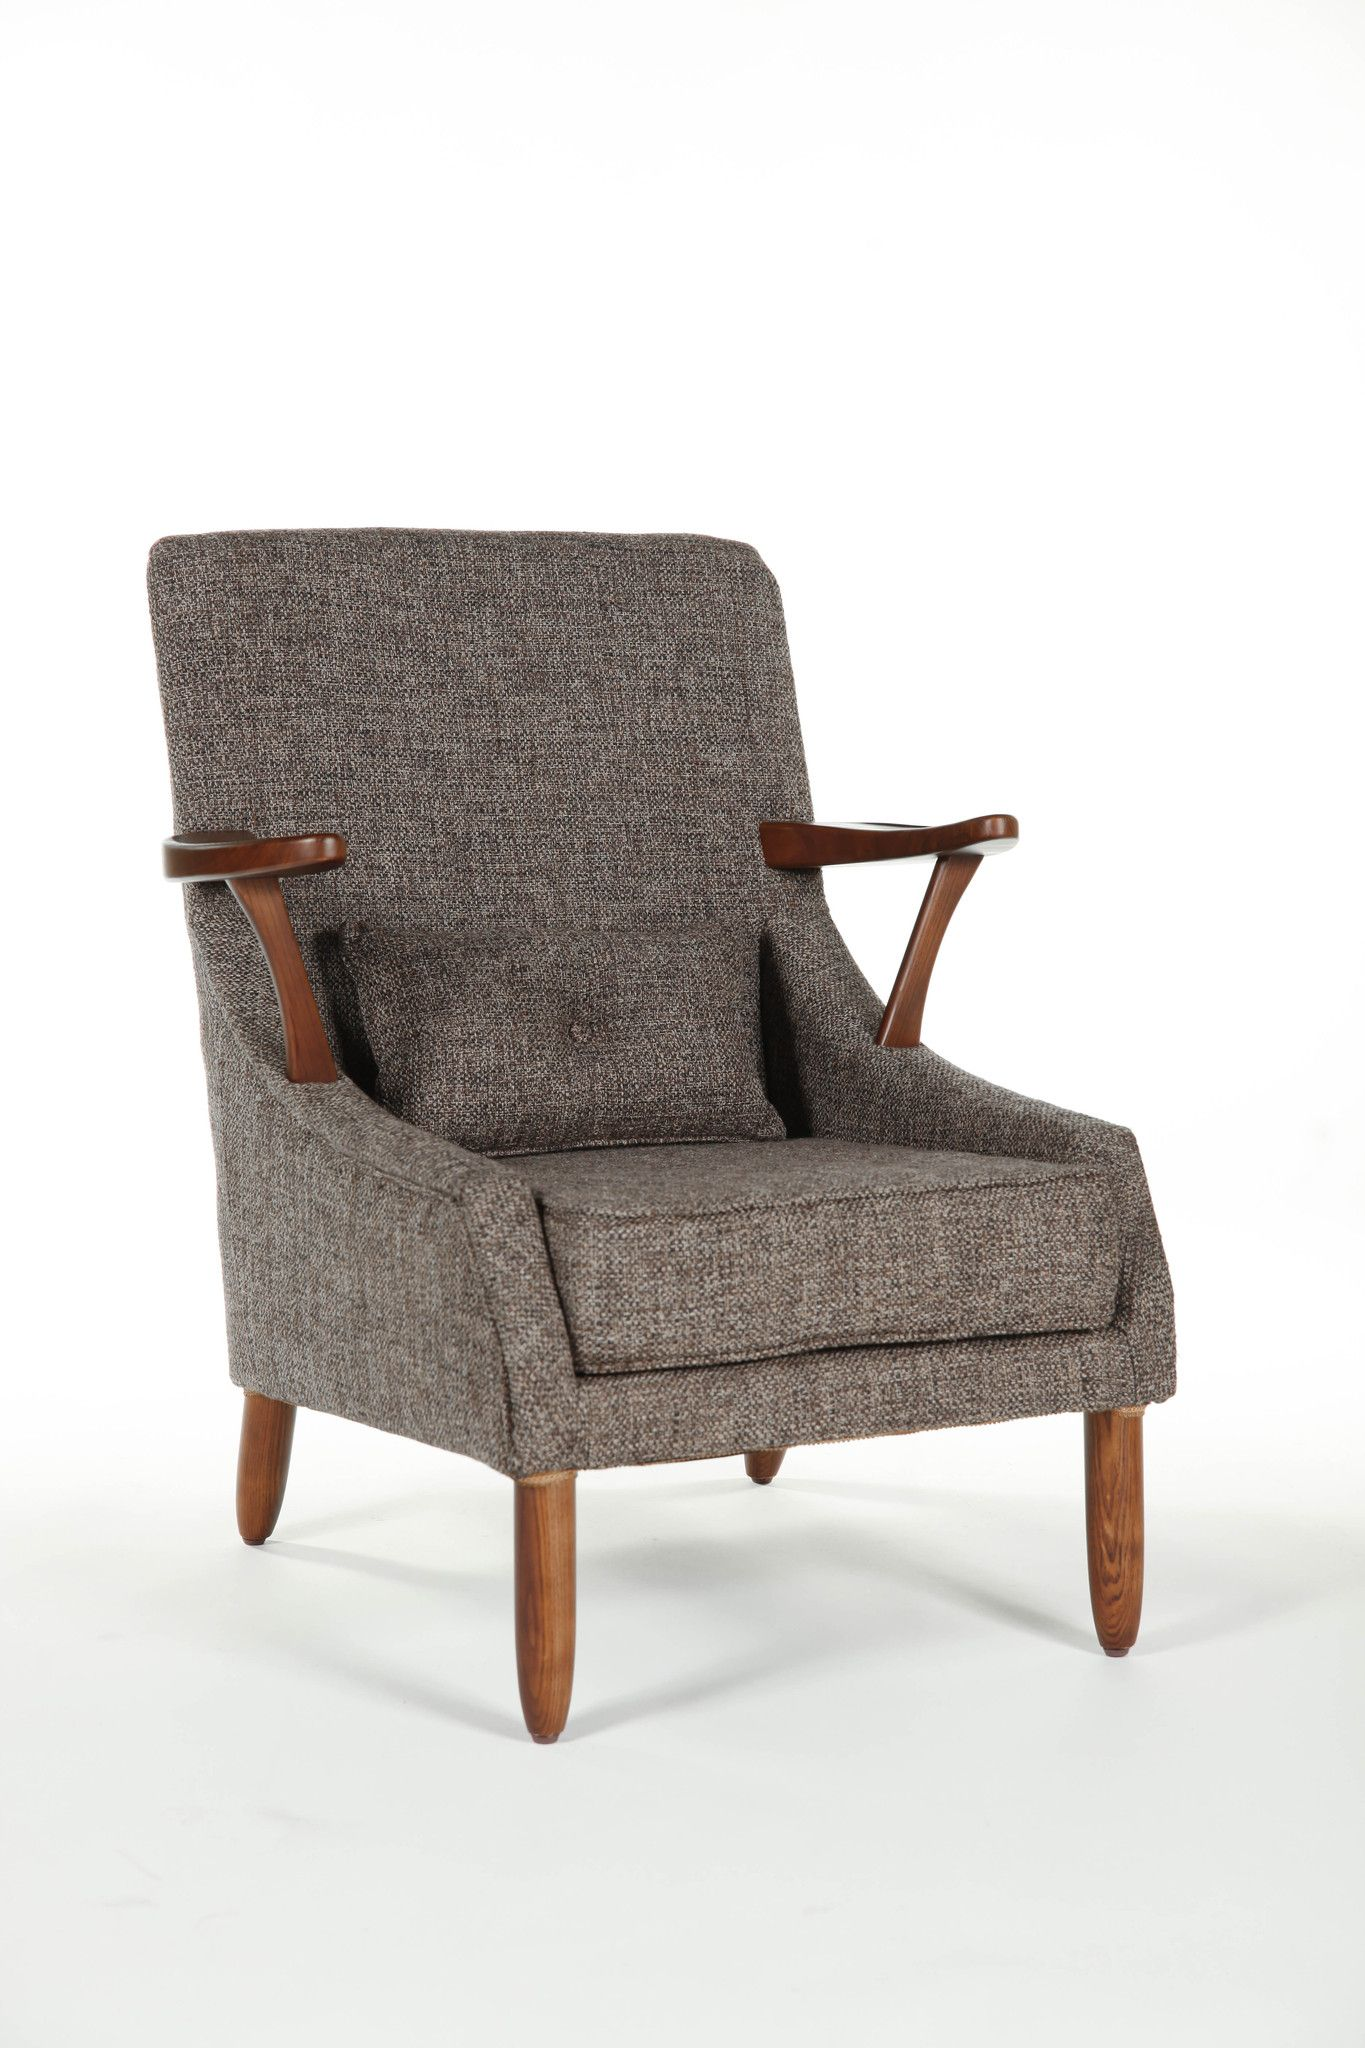 Mid Centrury Modern Fabric Brown Arm Chair